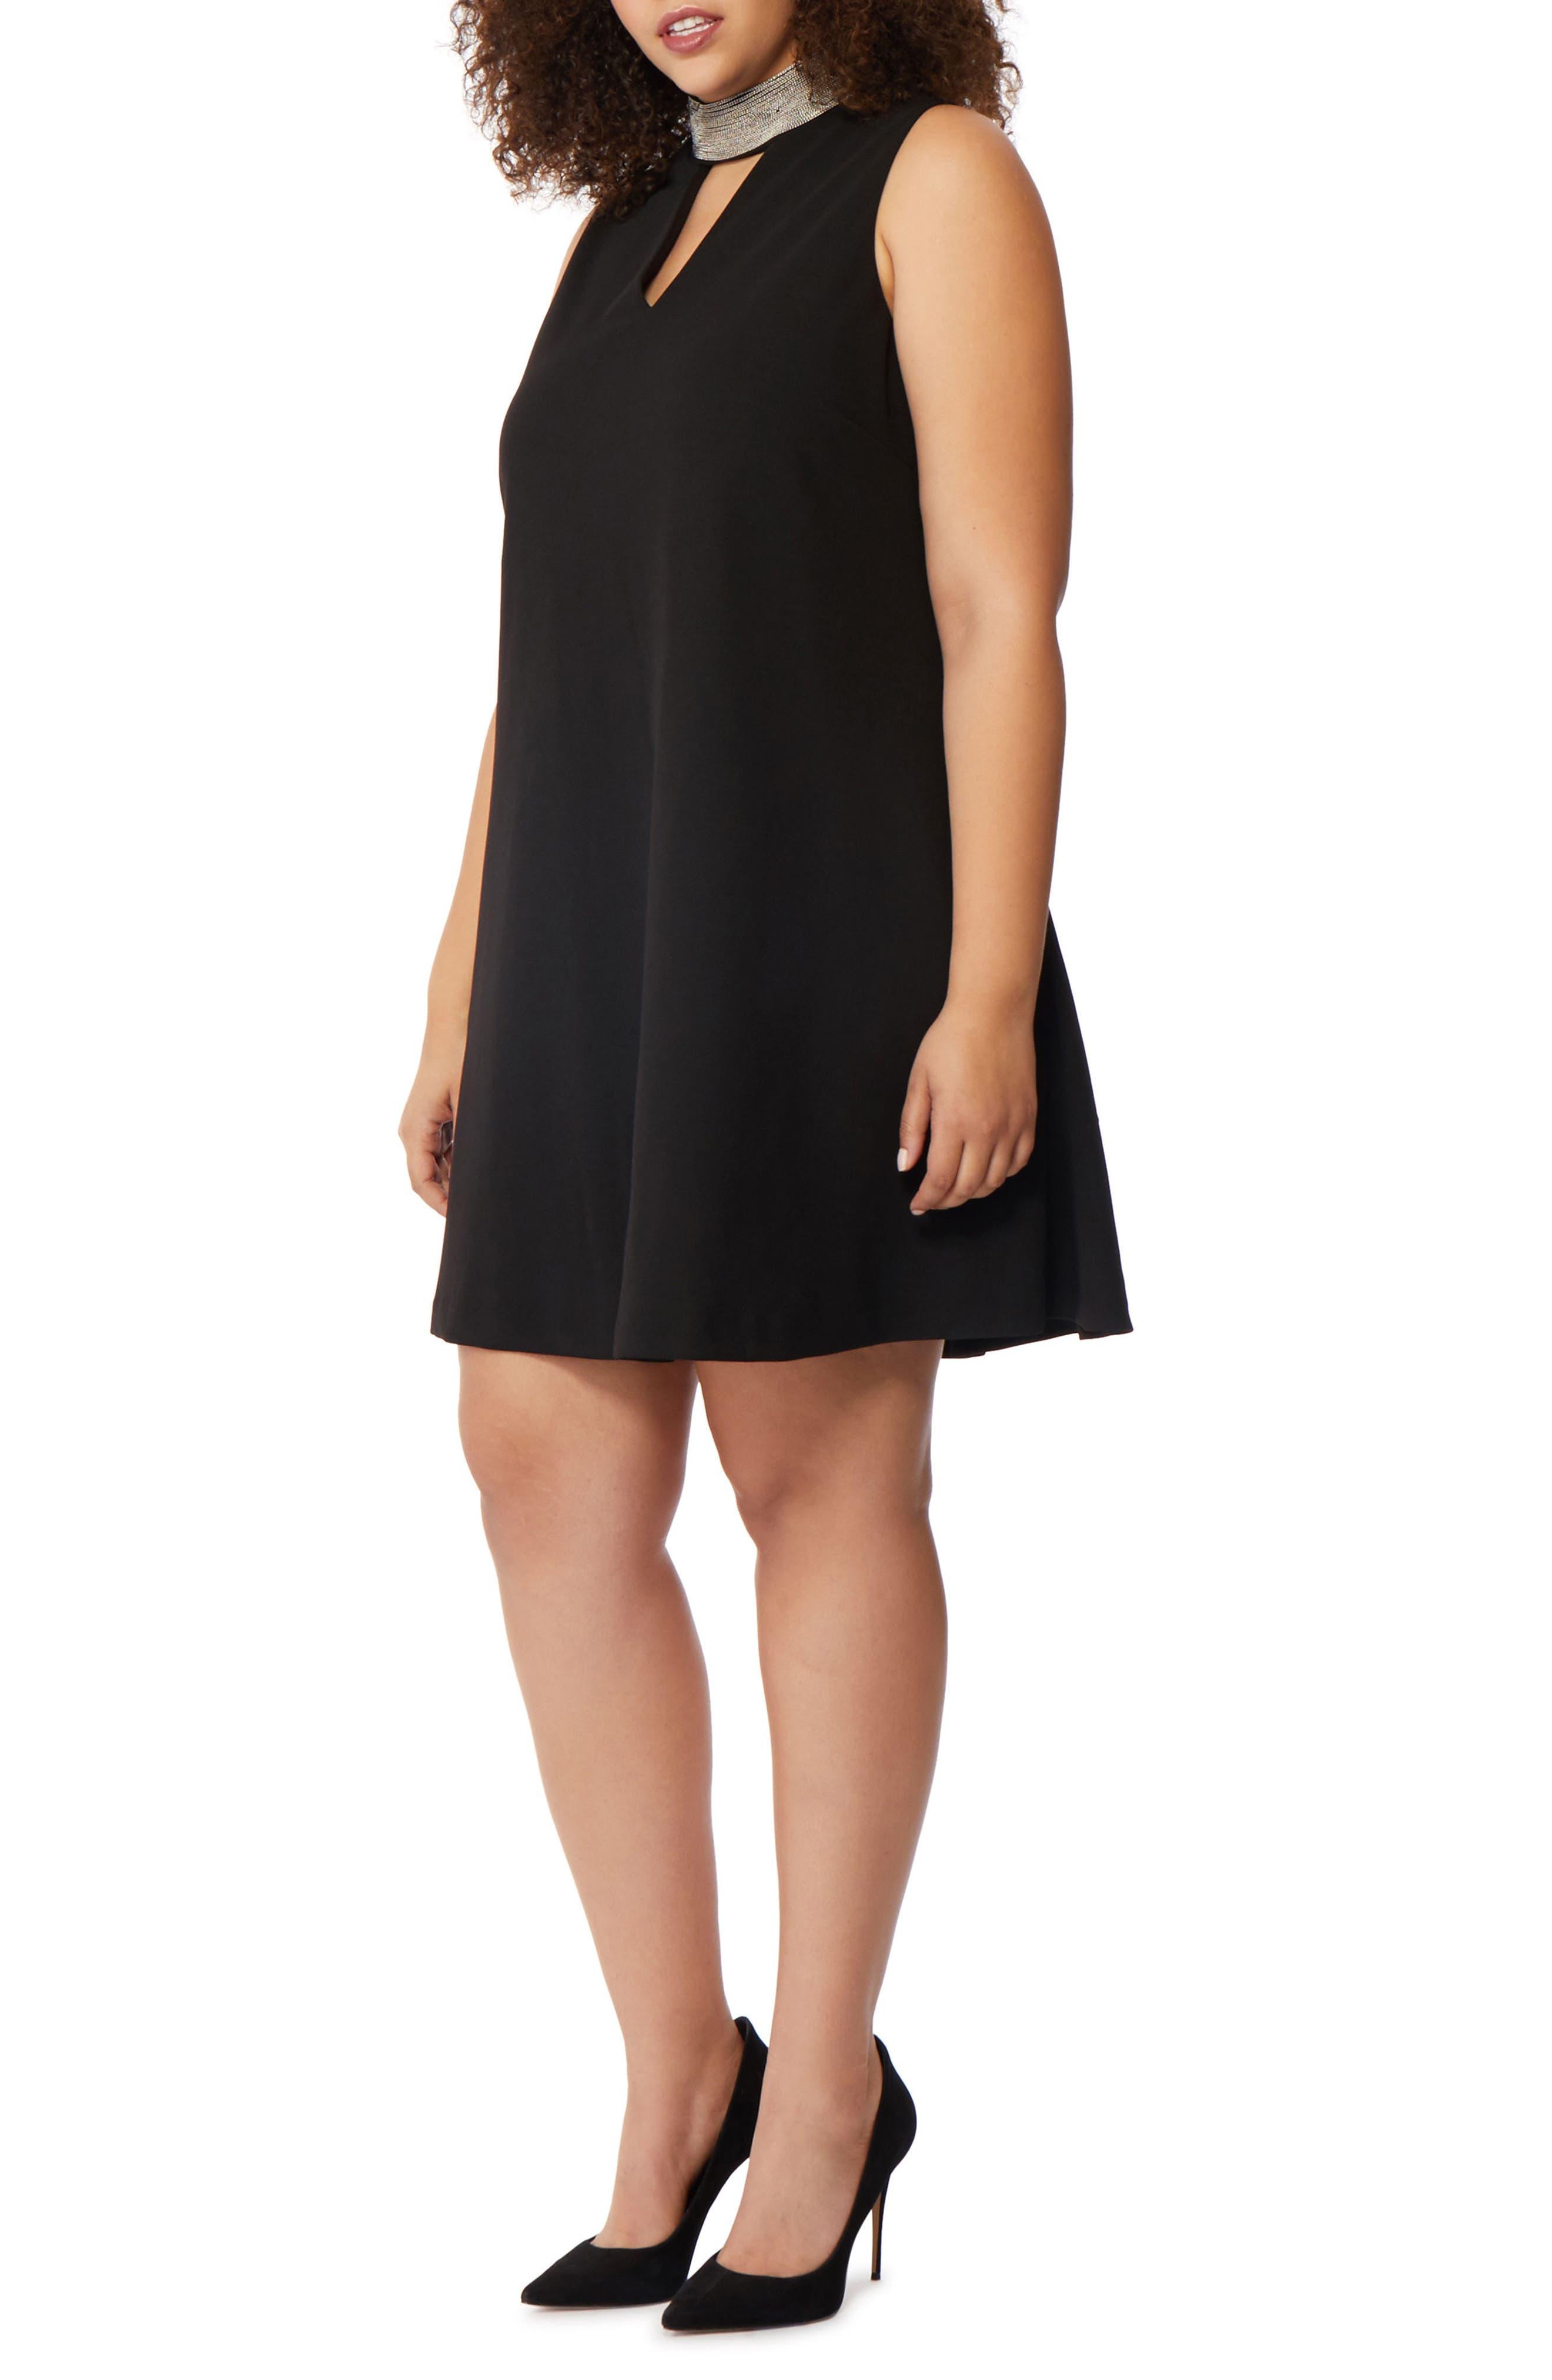 REBEL WILSON X ANGELS Beaded Choker Dress (Plus Size)